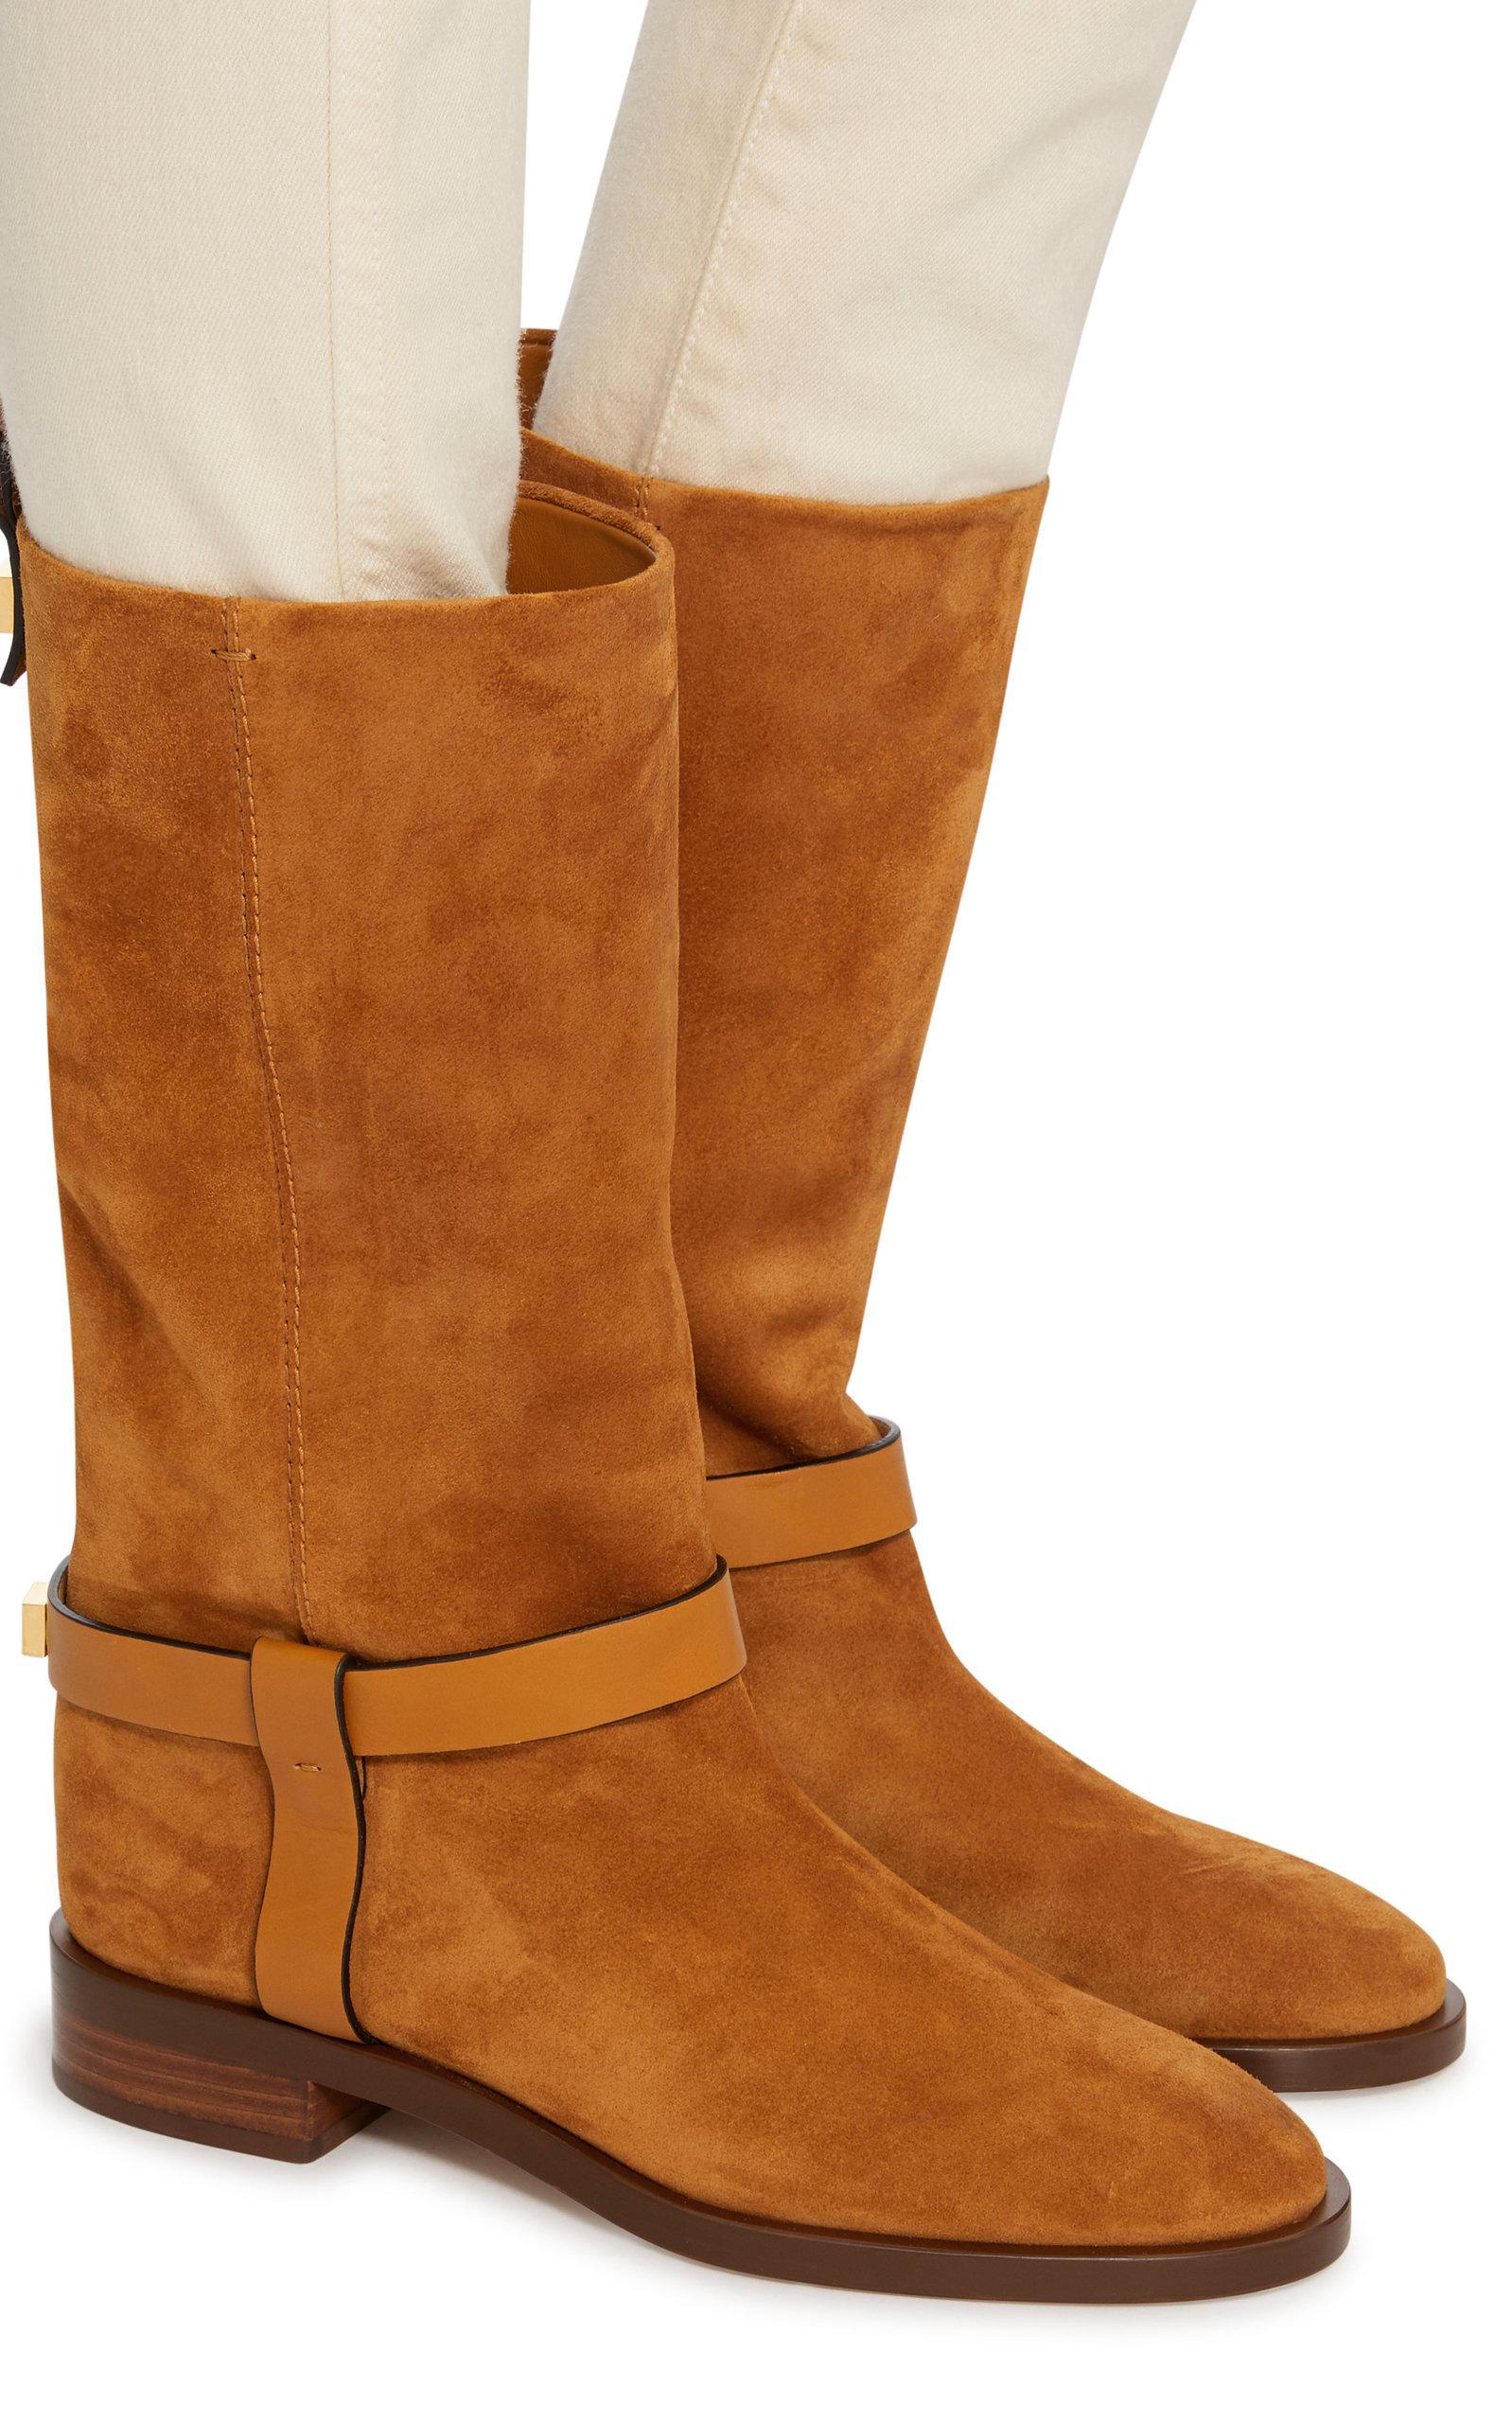 Weitzman Leather Zwxp4q7vu Suede Trimmed Boots Casey Stuart Iw05Bx